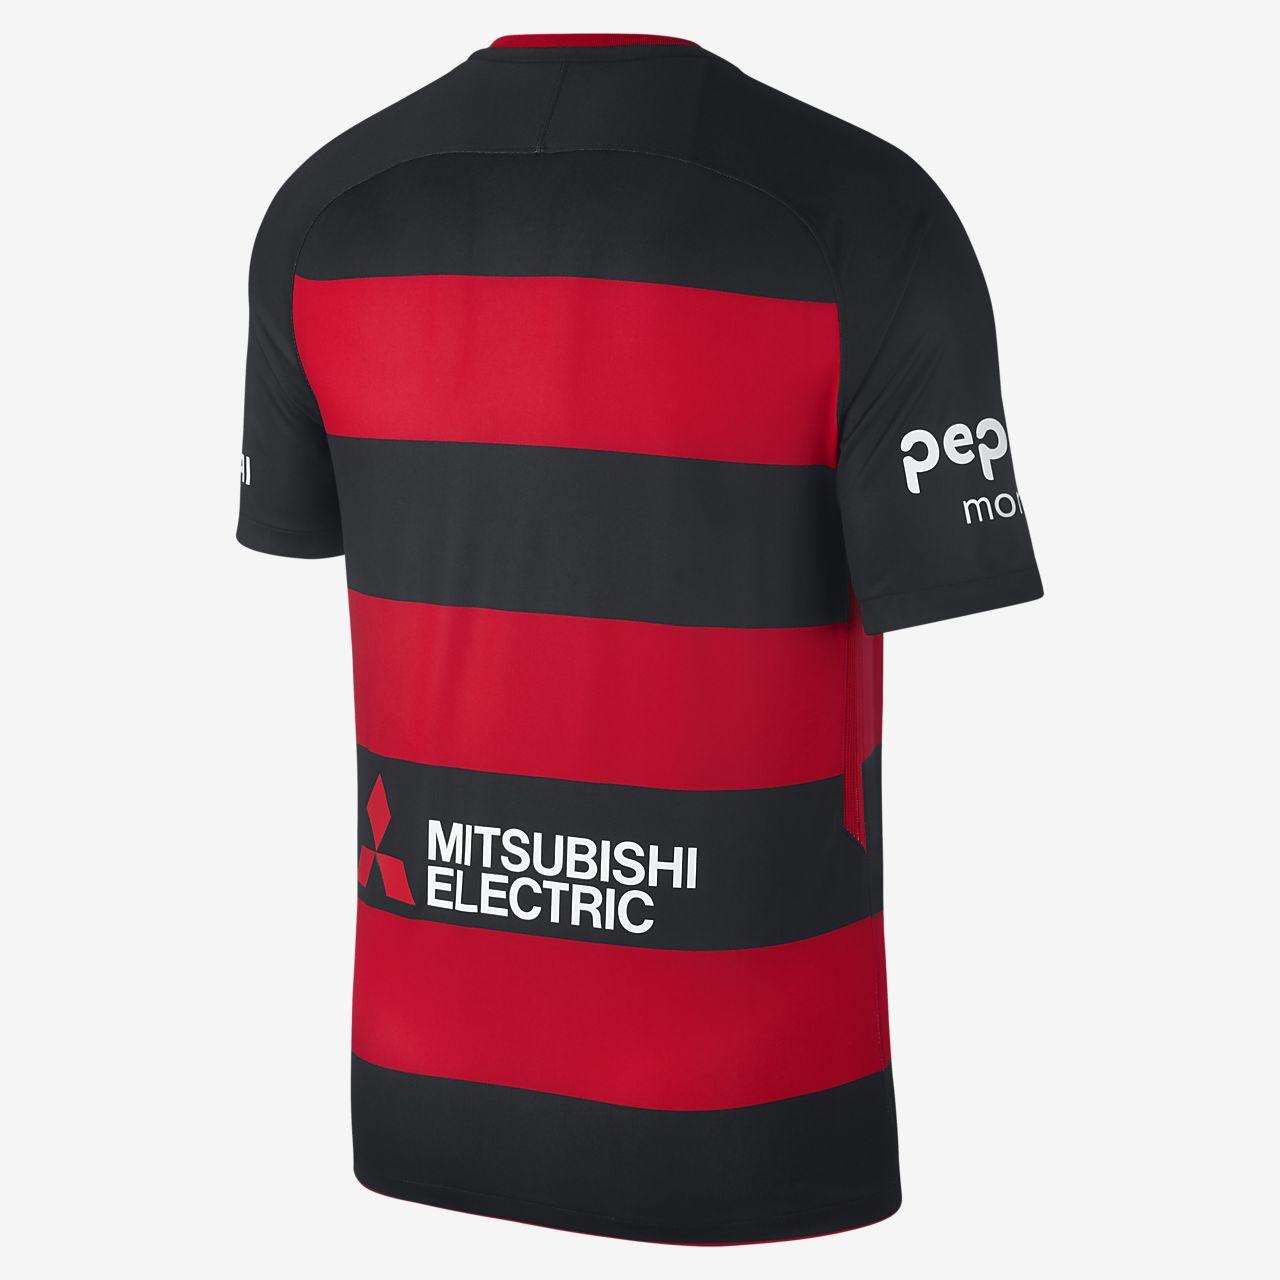 ... temporada Camiseta de fútbol para hombre Western Sydney FC de local  para aficionados ce25bd1f983d7